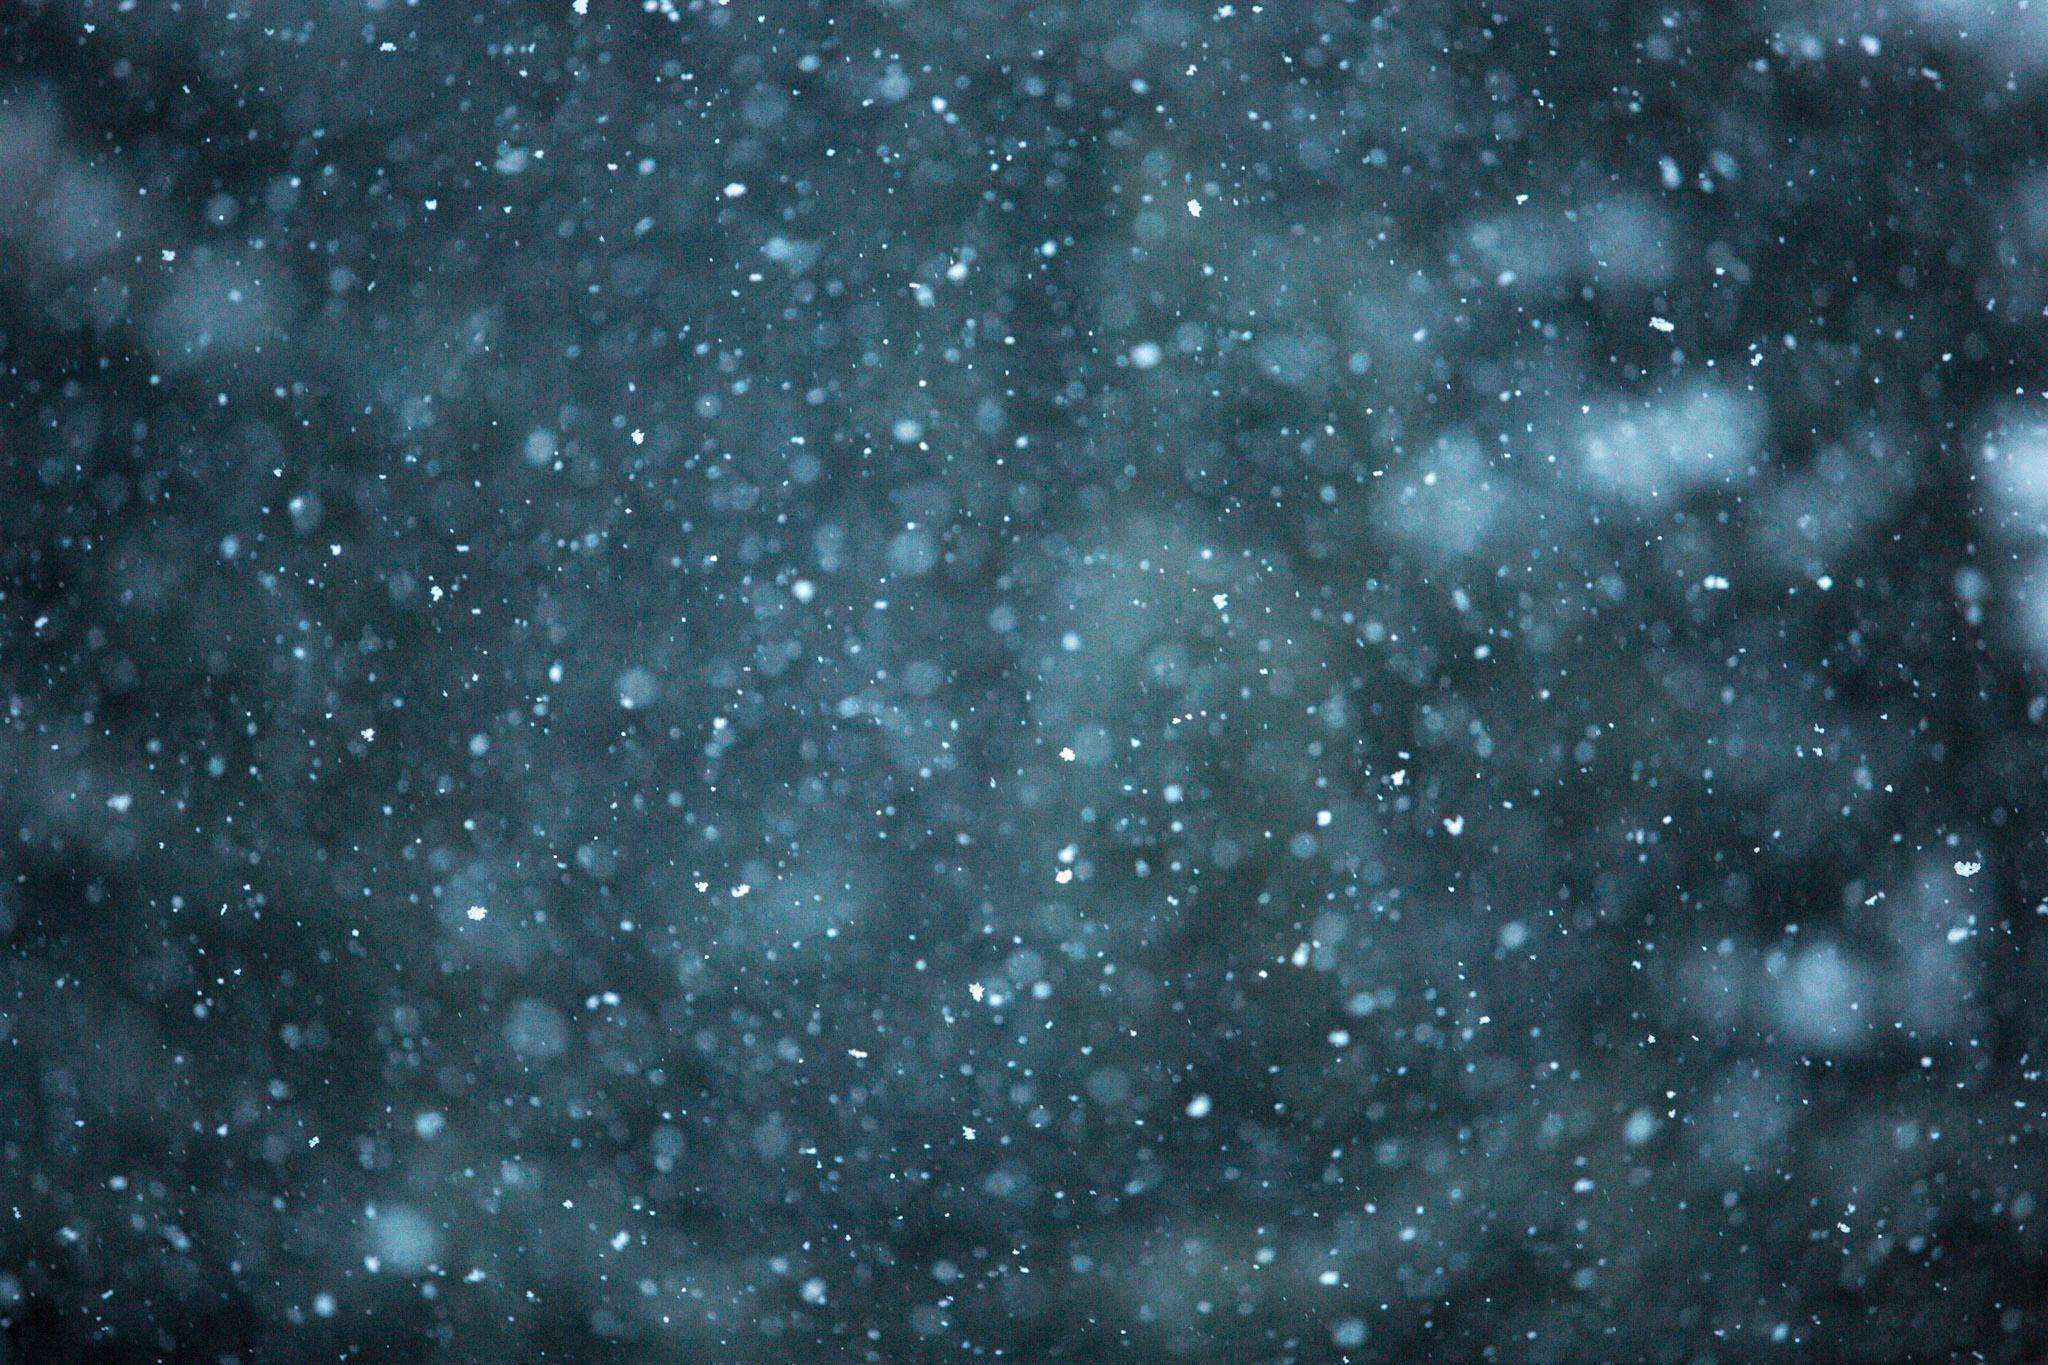 Snowfall in Killington, Vermont